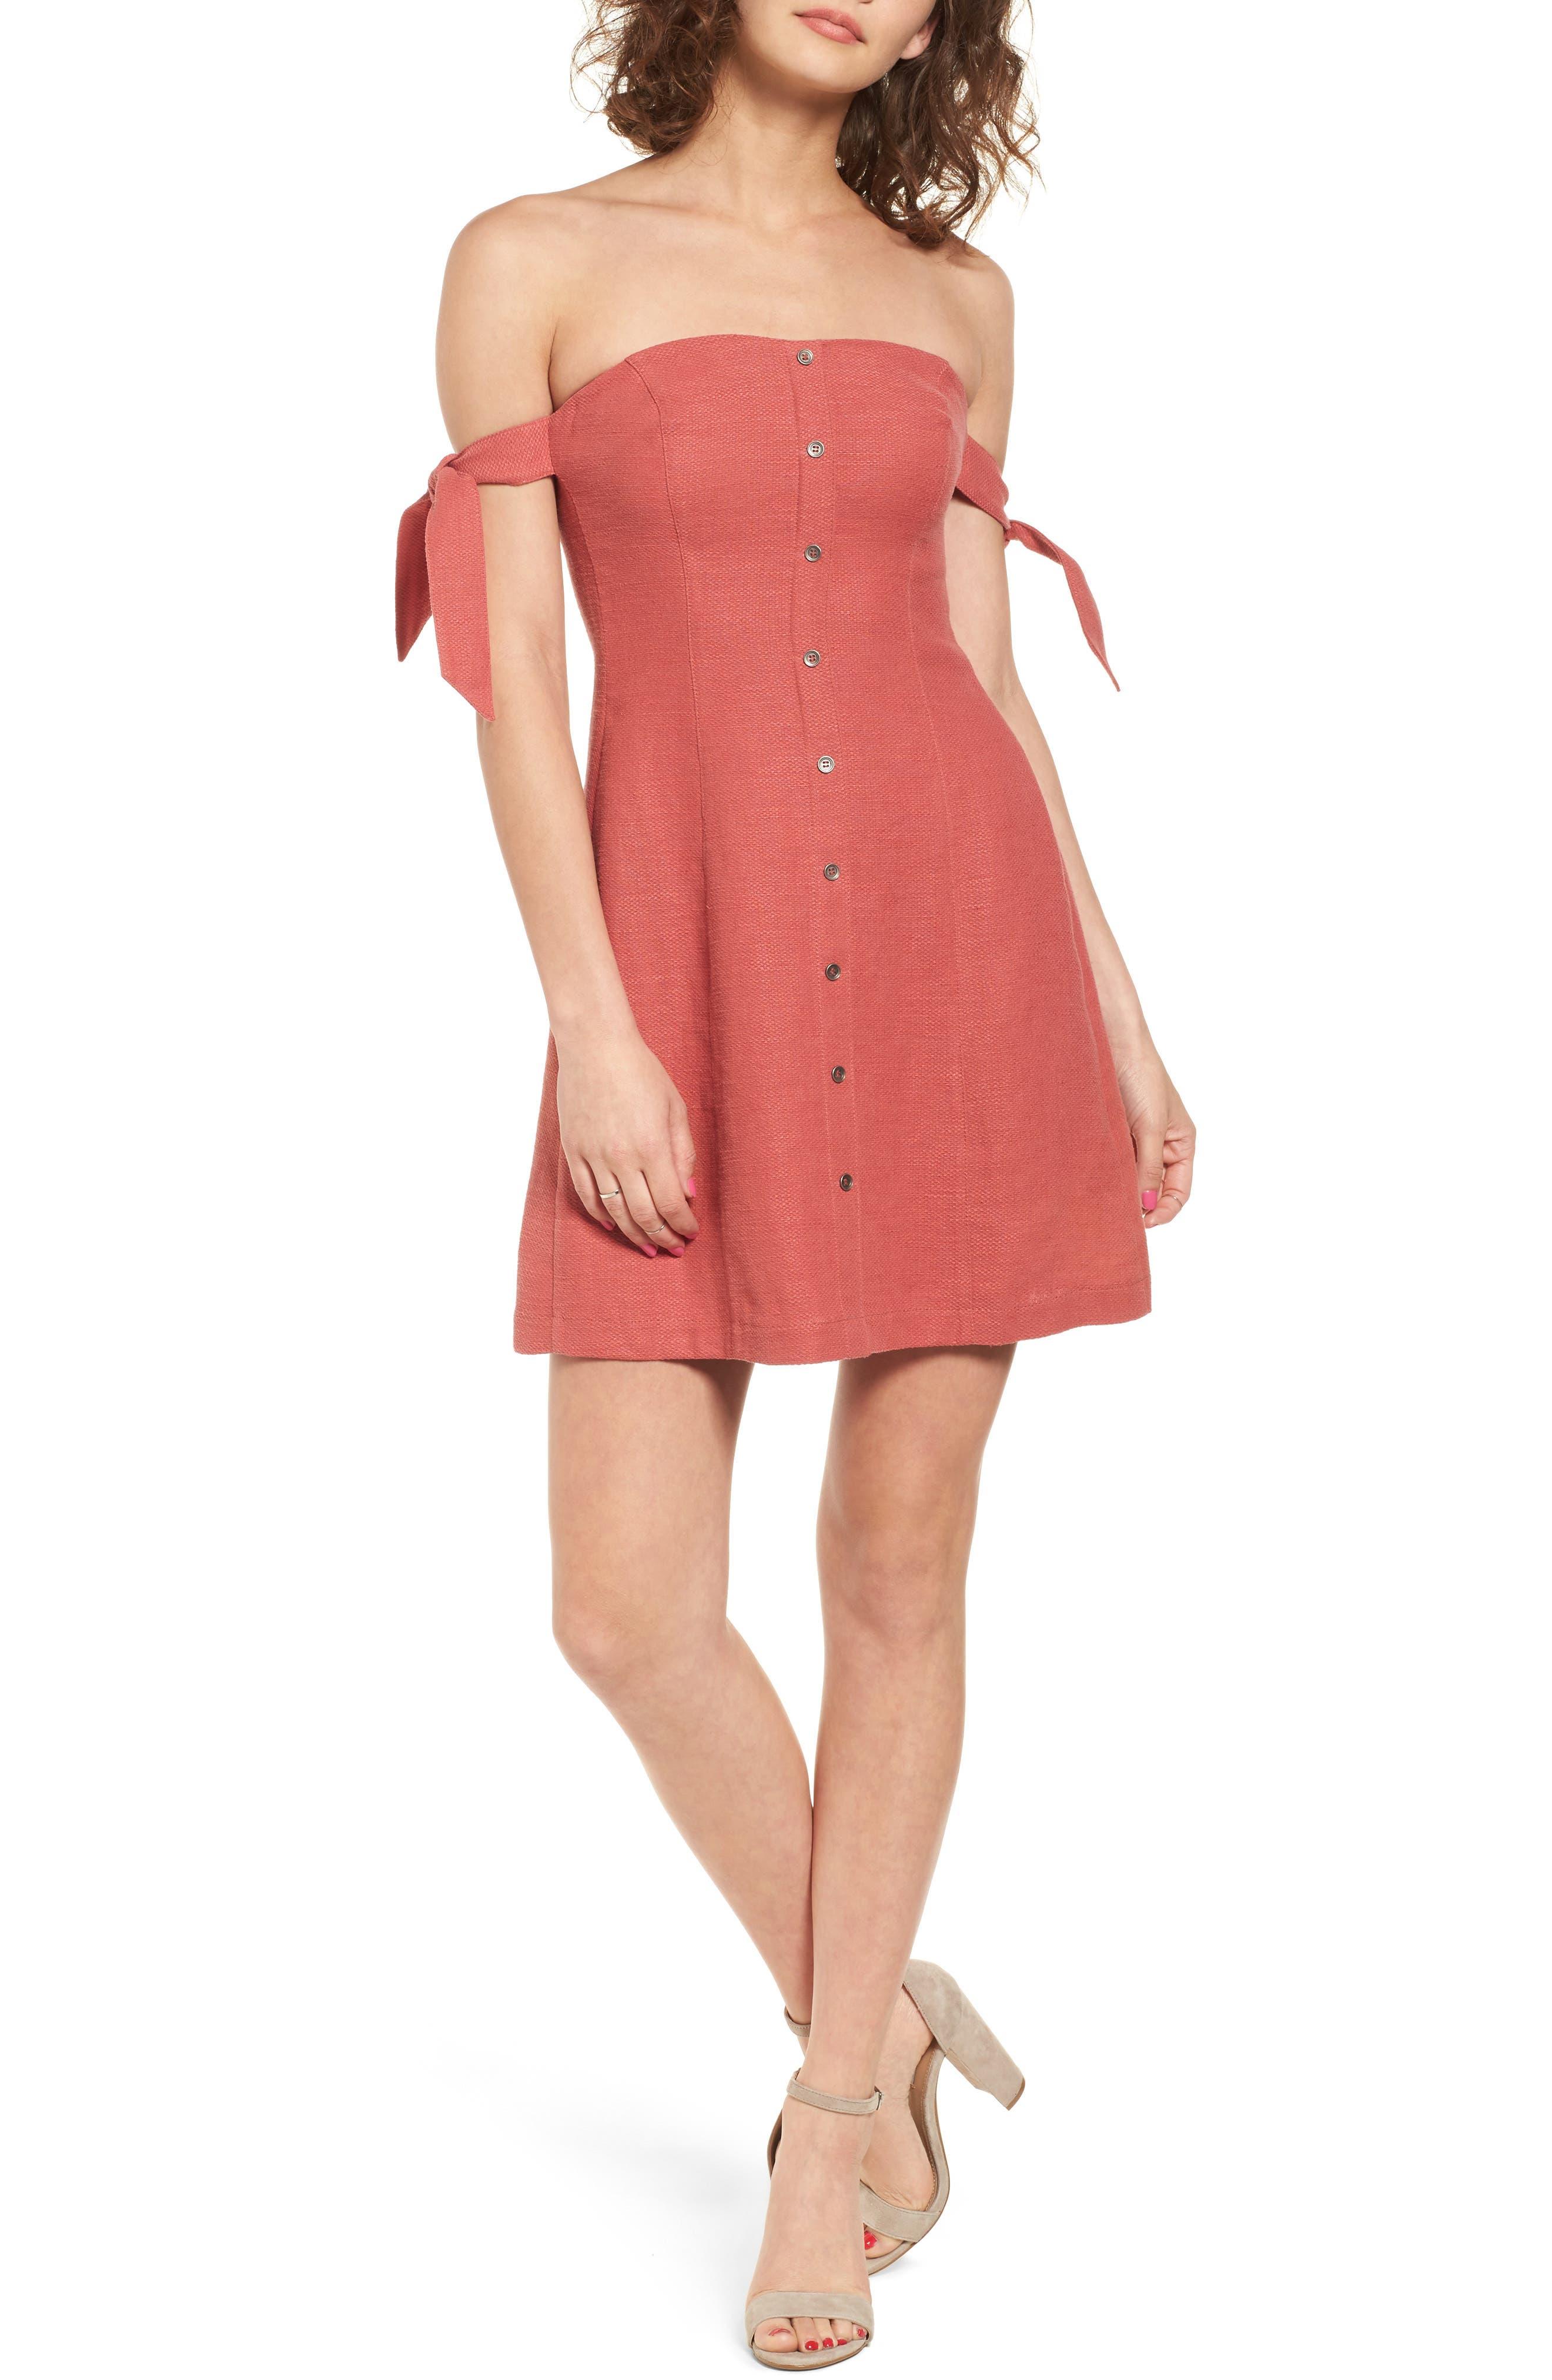 Main Image - ASTR the Label Araceli Minidress